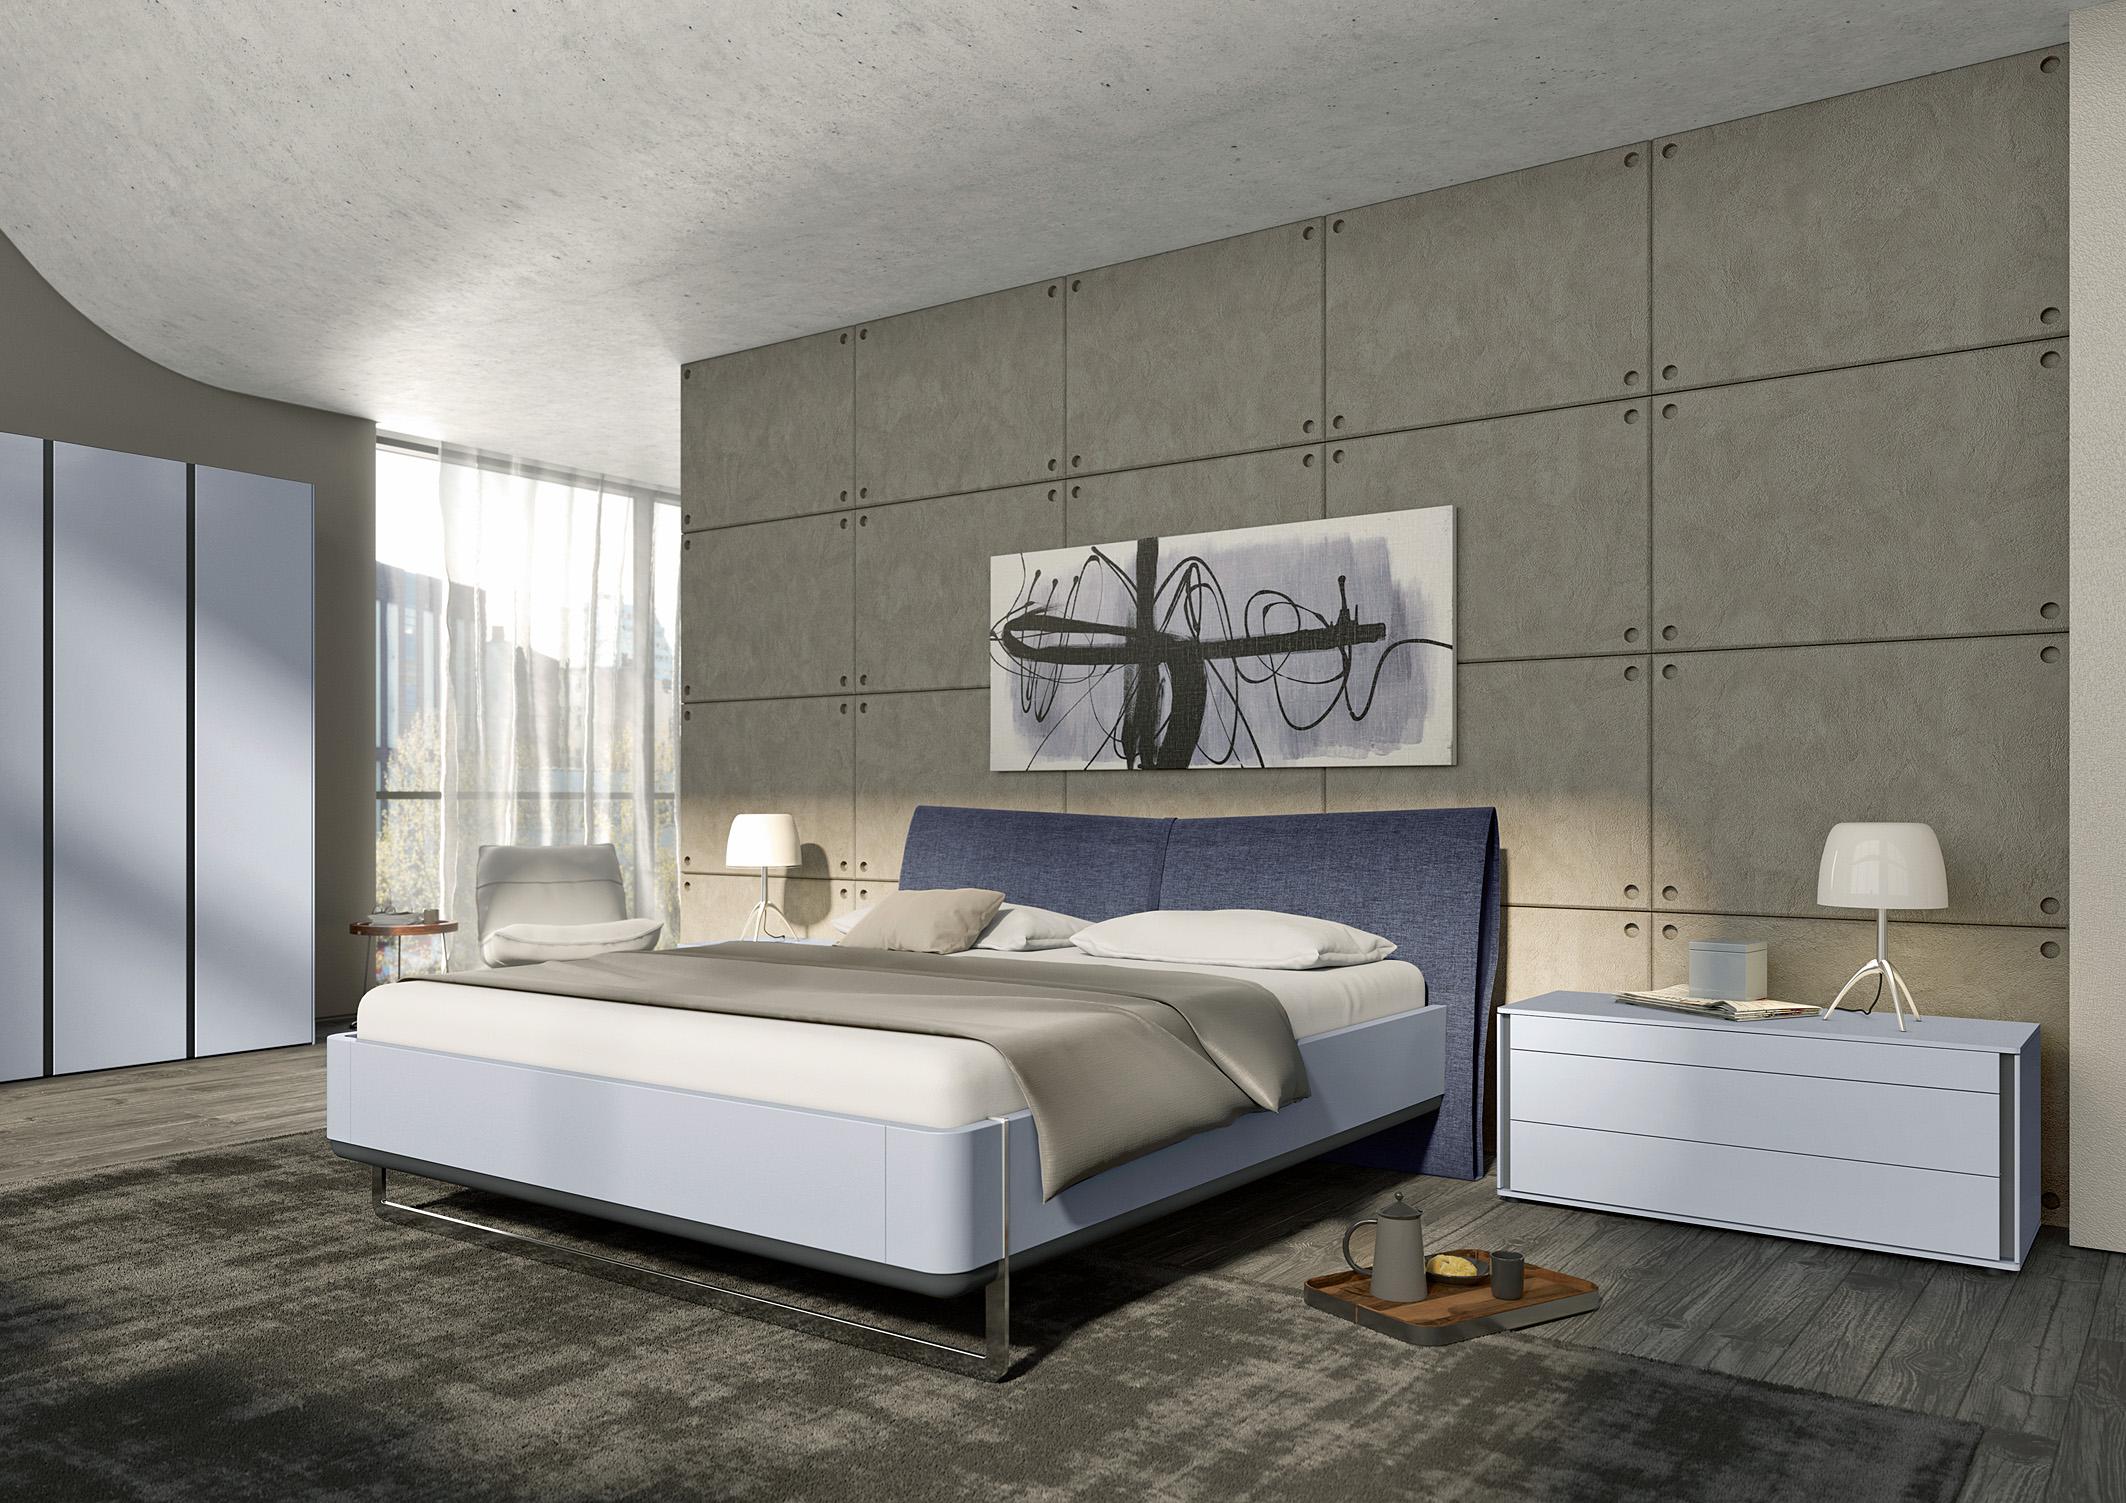 pm 2017 dgm bettenkauf. Black Bedroom Furniture Sets. Home Design Ideas